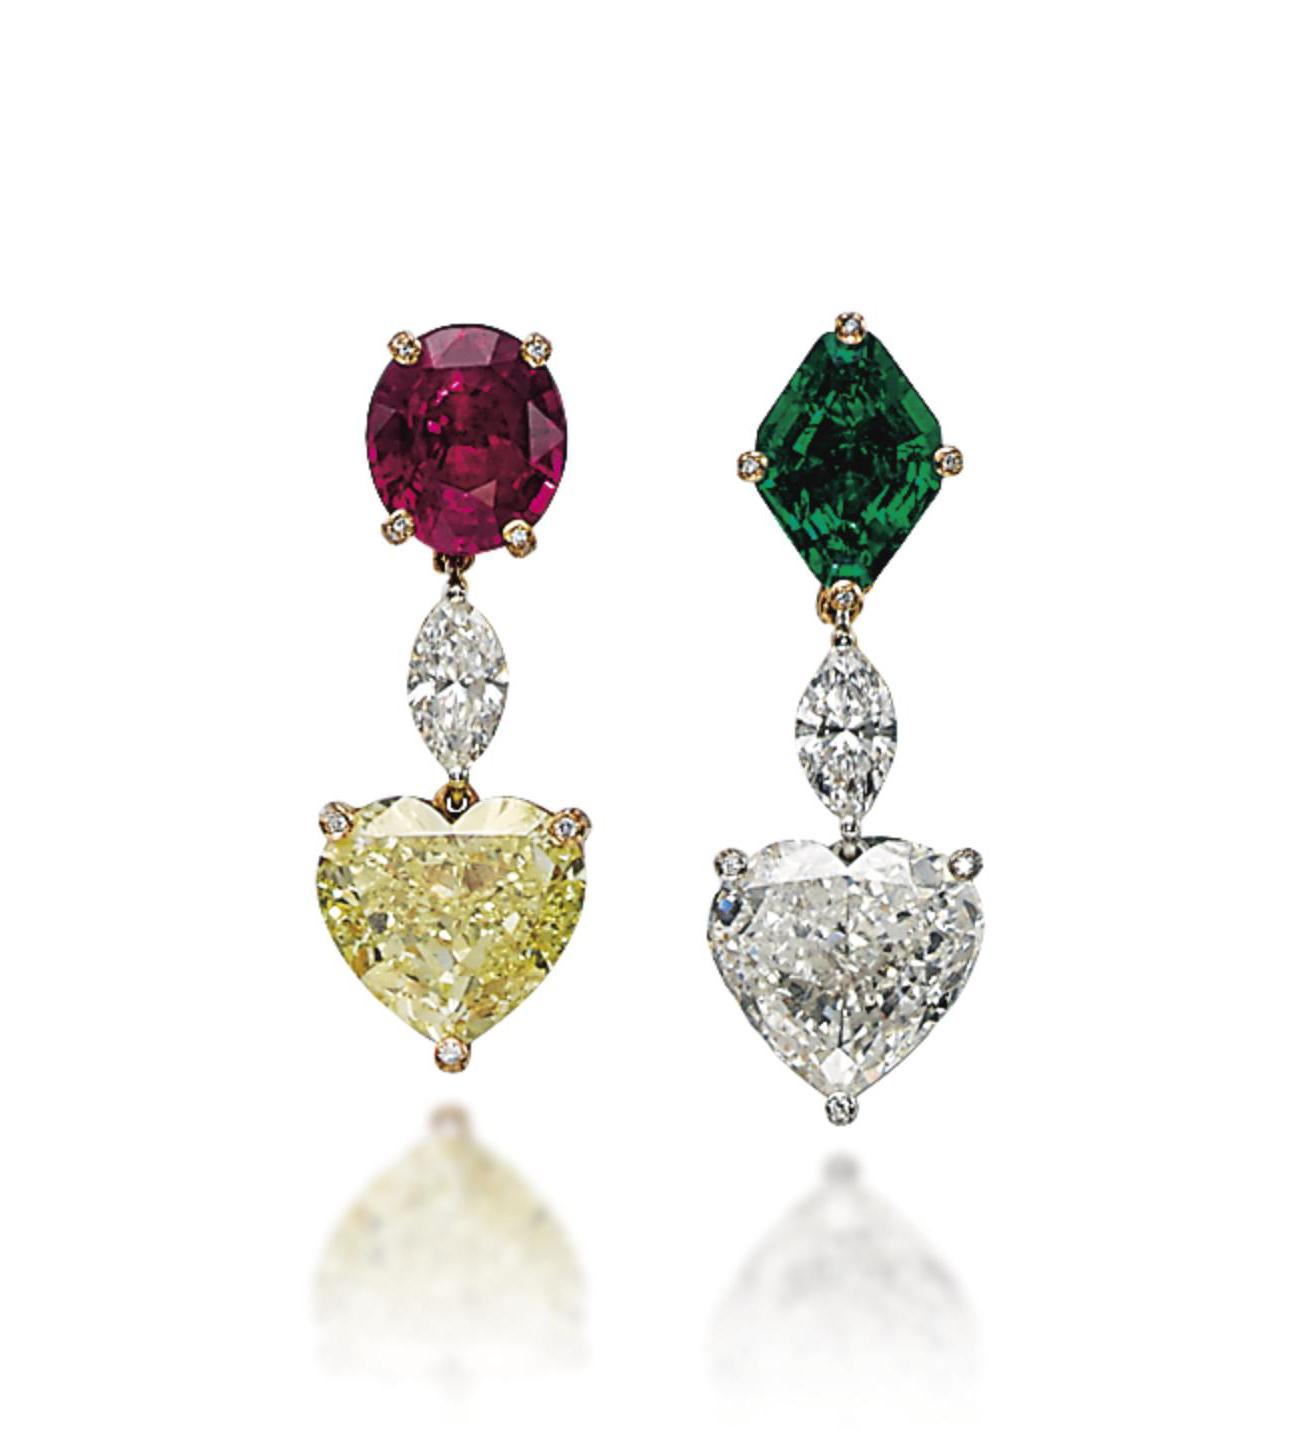 A PAIR OF DIAMOND, COLOURED DIAMOND, RUBY AND EMERALD EAR PENDANTS, BY DE GRISOGONO